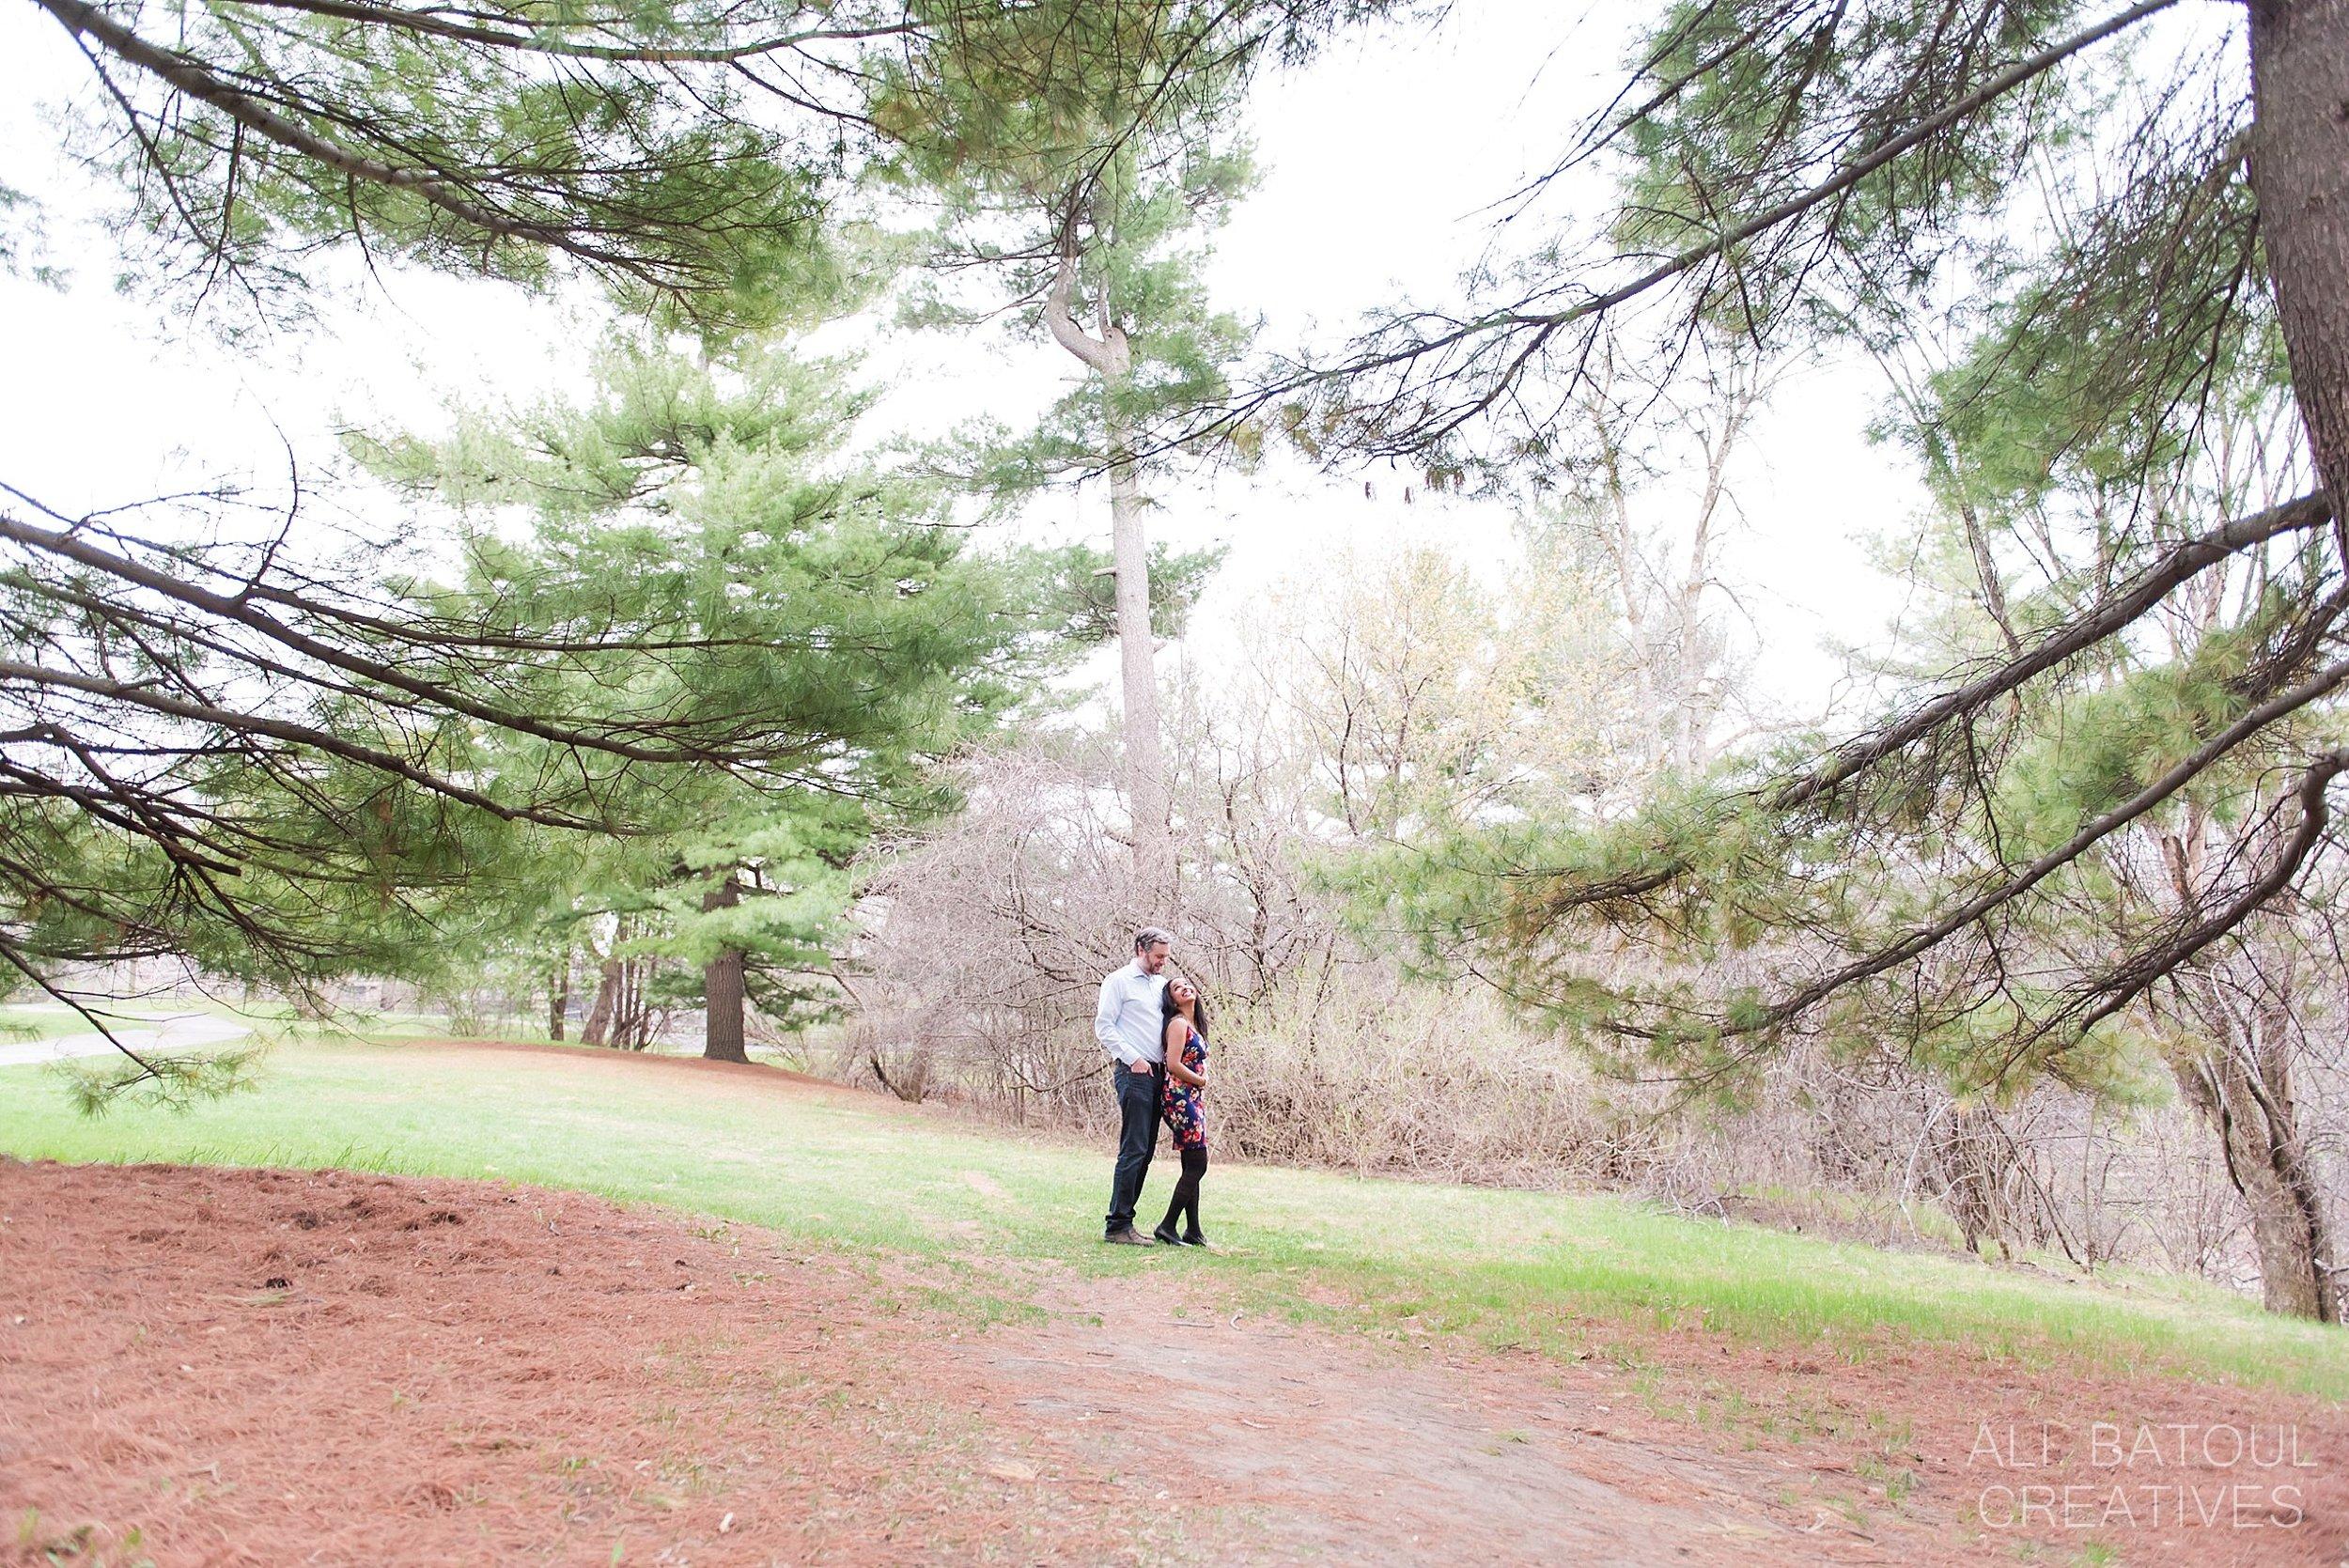 Uzma + Ian Engagement - Ali Batoul Creatives Fine Art Wedding Photography_0226.jpg